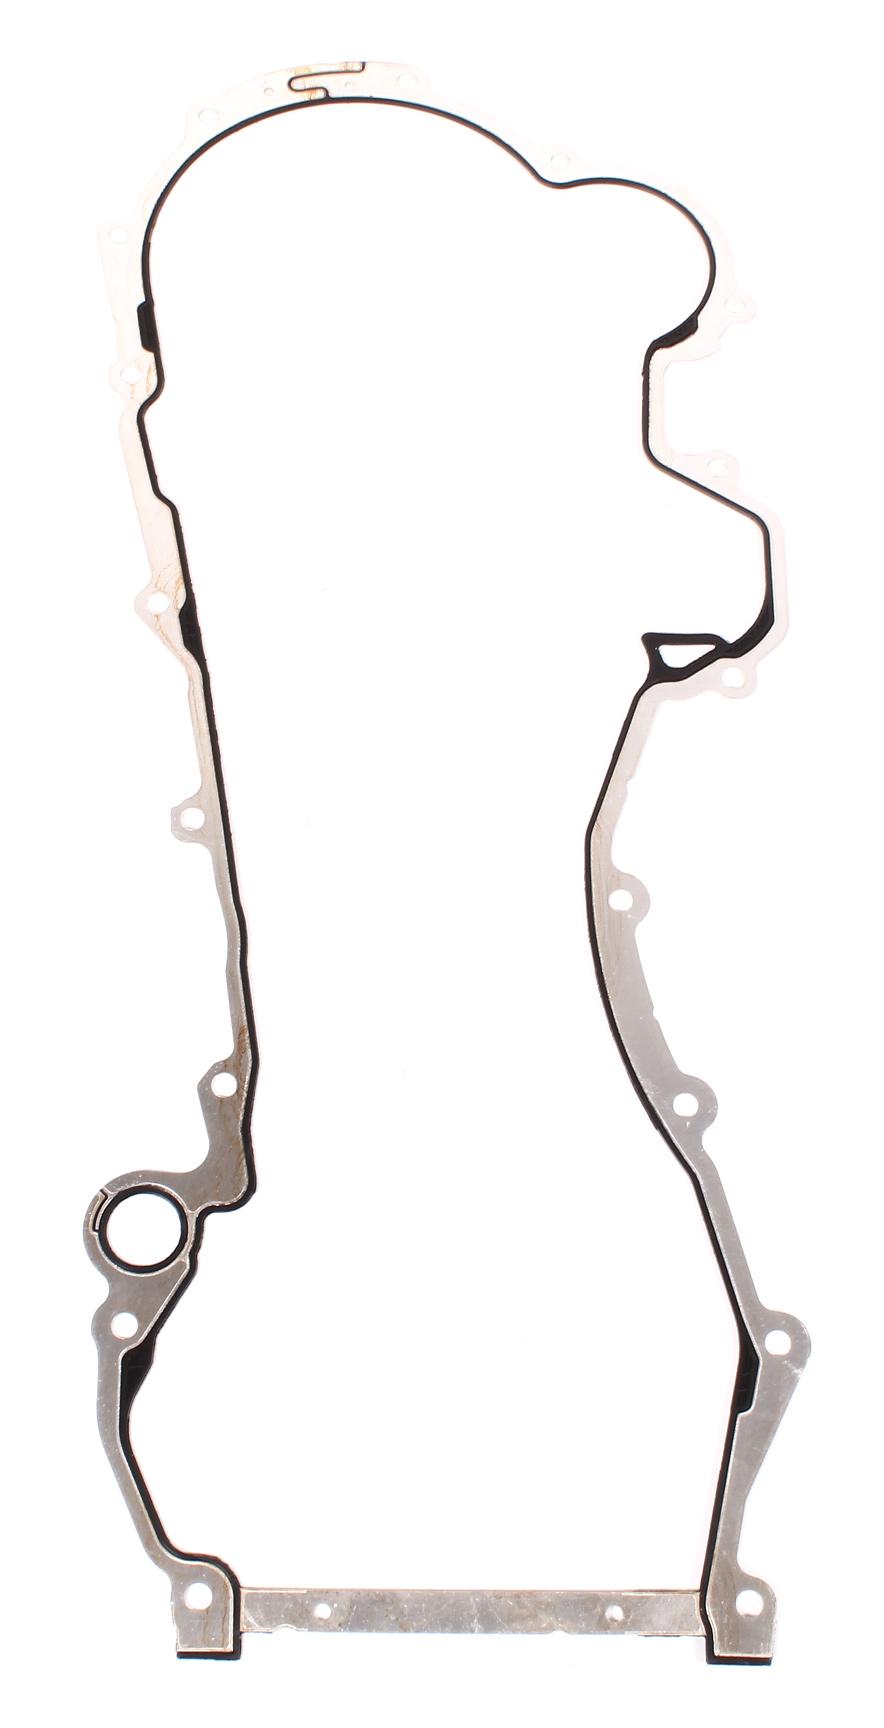 Stirndeckeldichtung Steuergehäusedichtung Fiat Opel 1,3 D 312B1000 312B2000 NEU